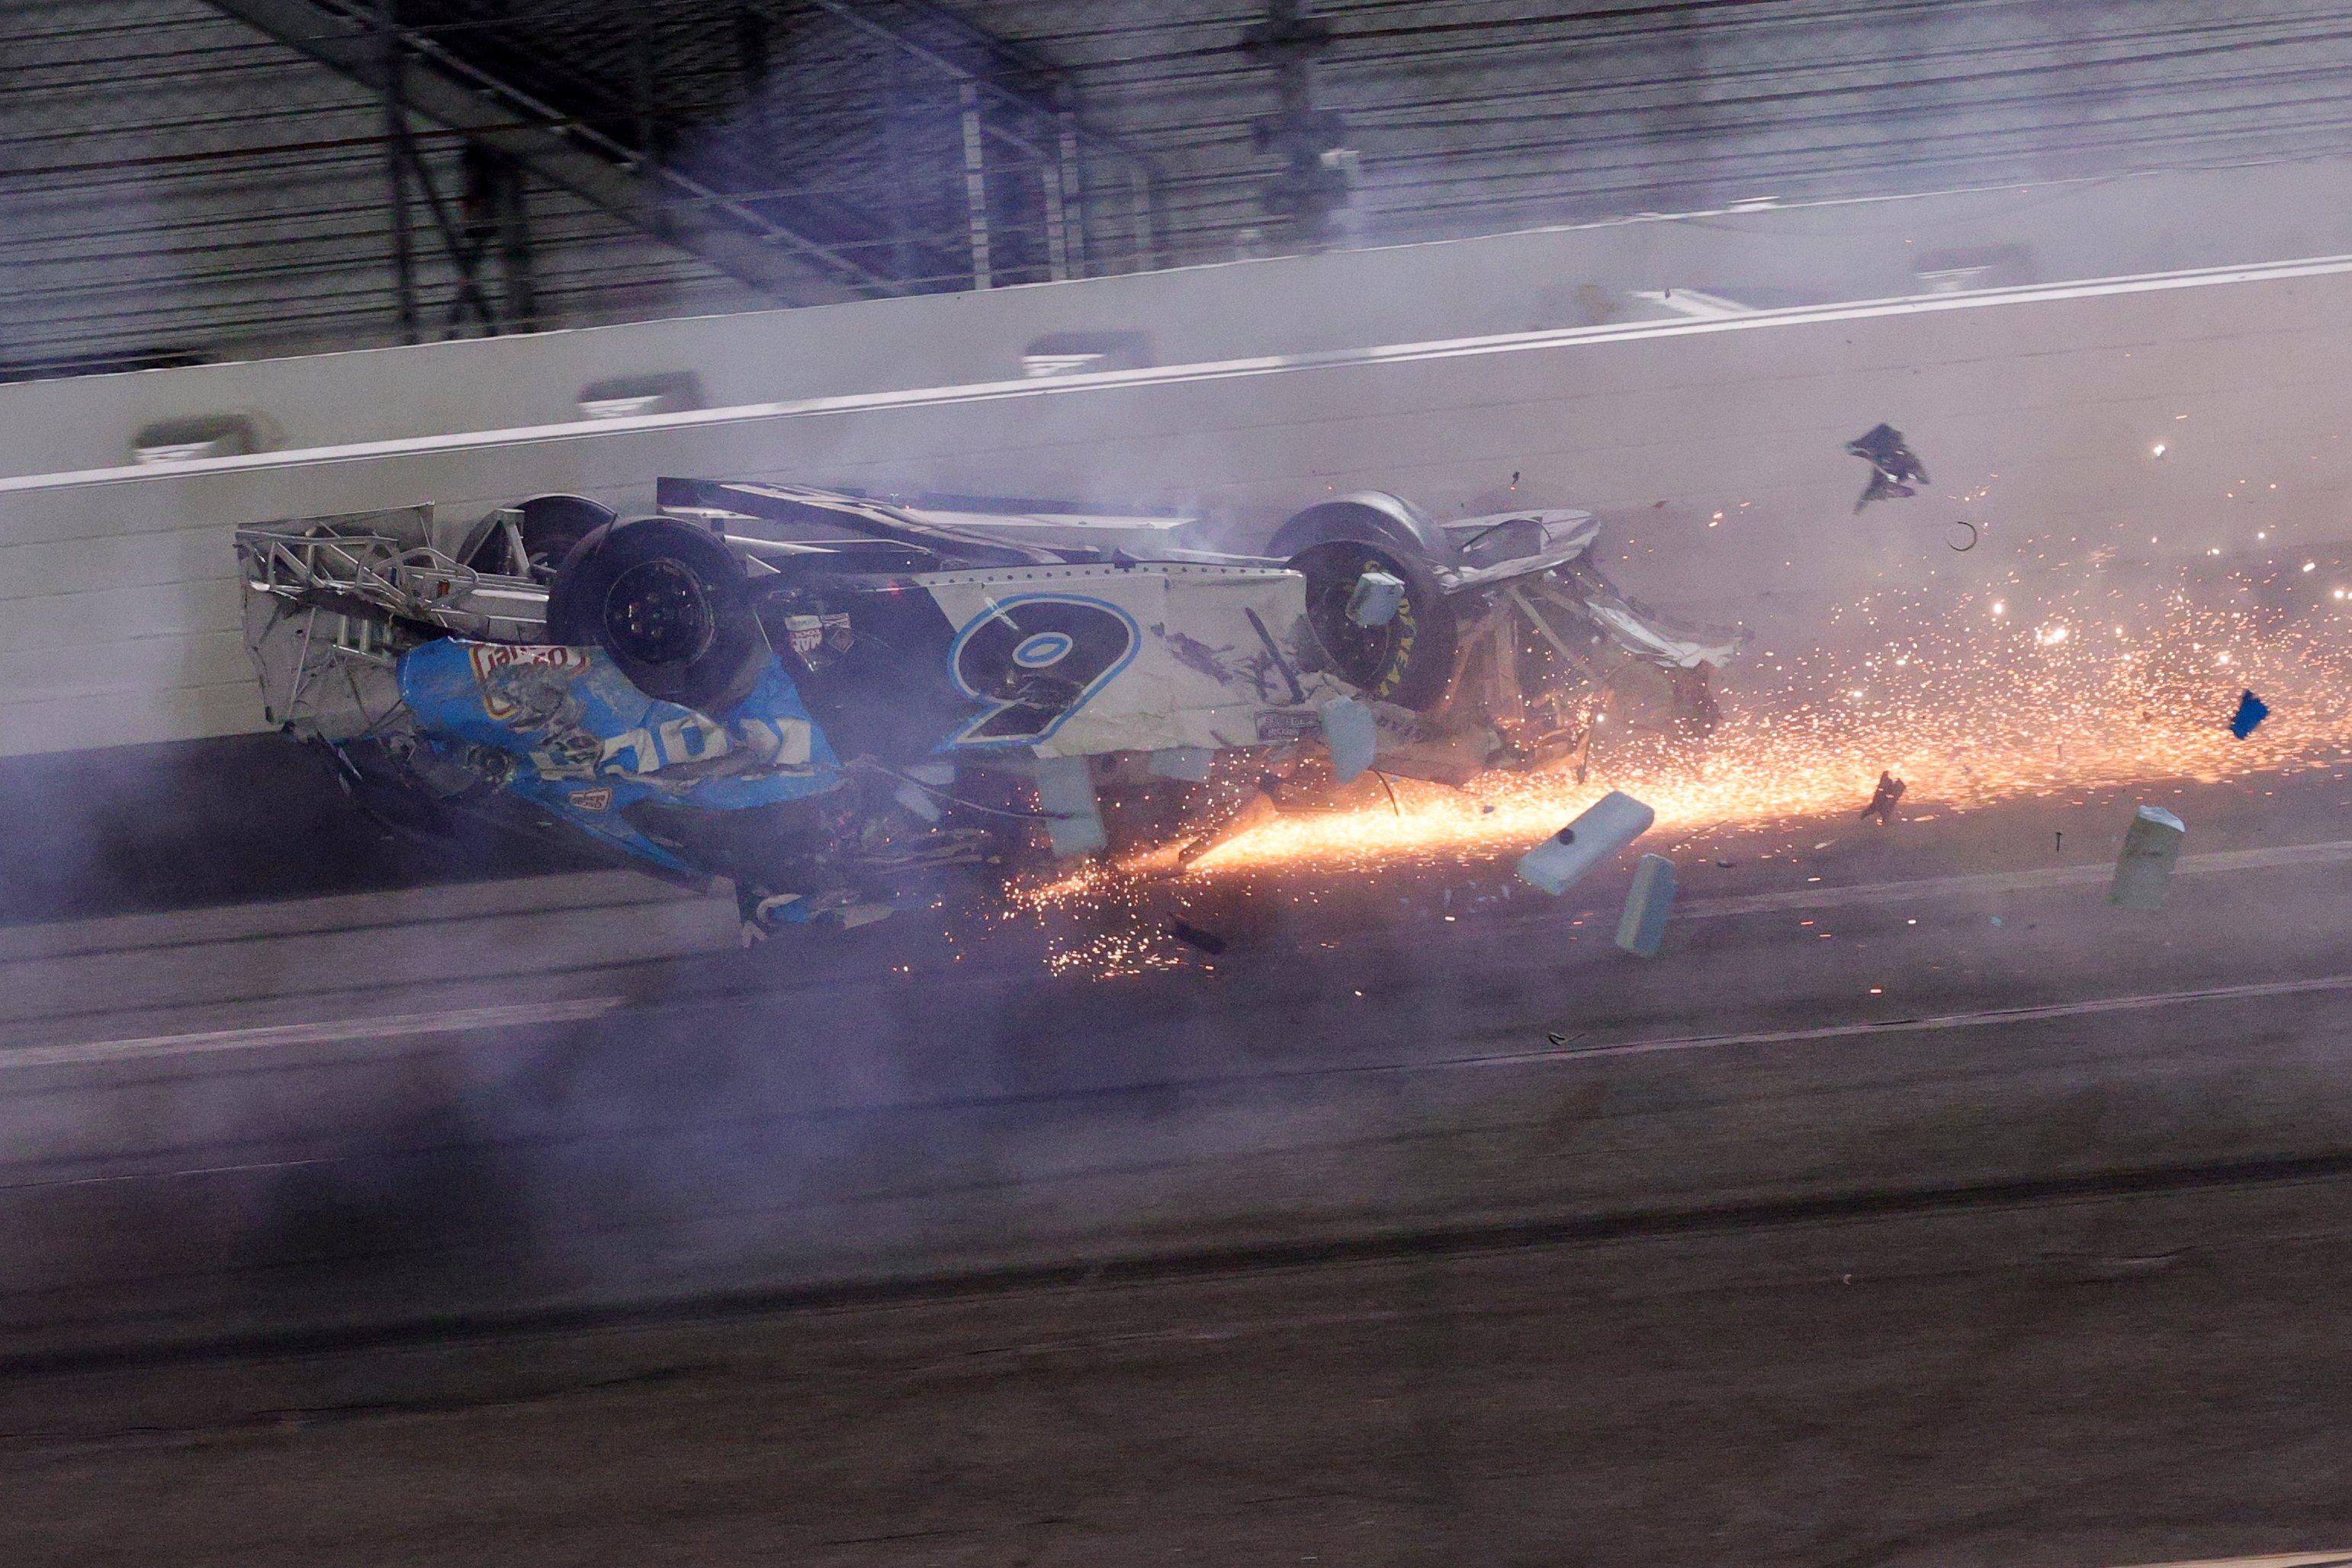 NASCAR driver Ryan Newman says Daytona 500 crash left him with a head injury